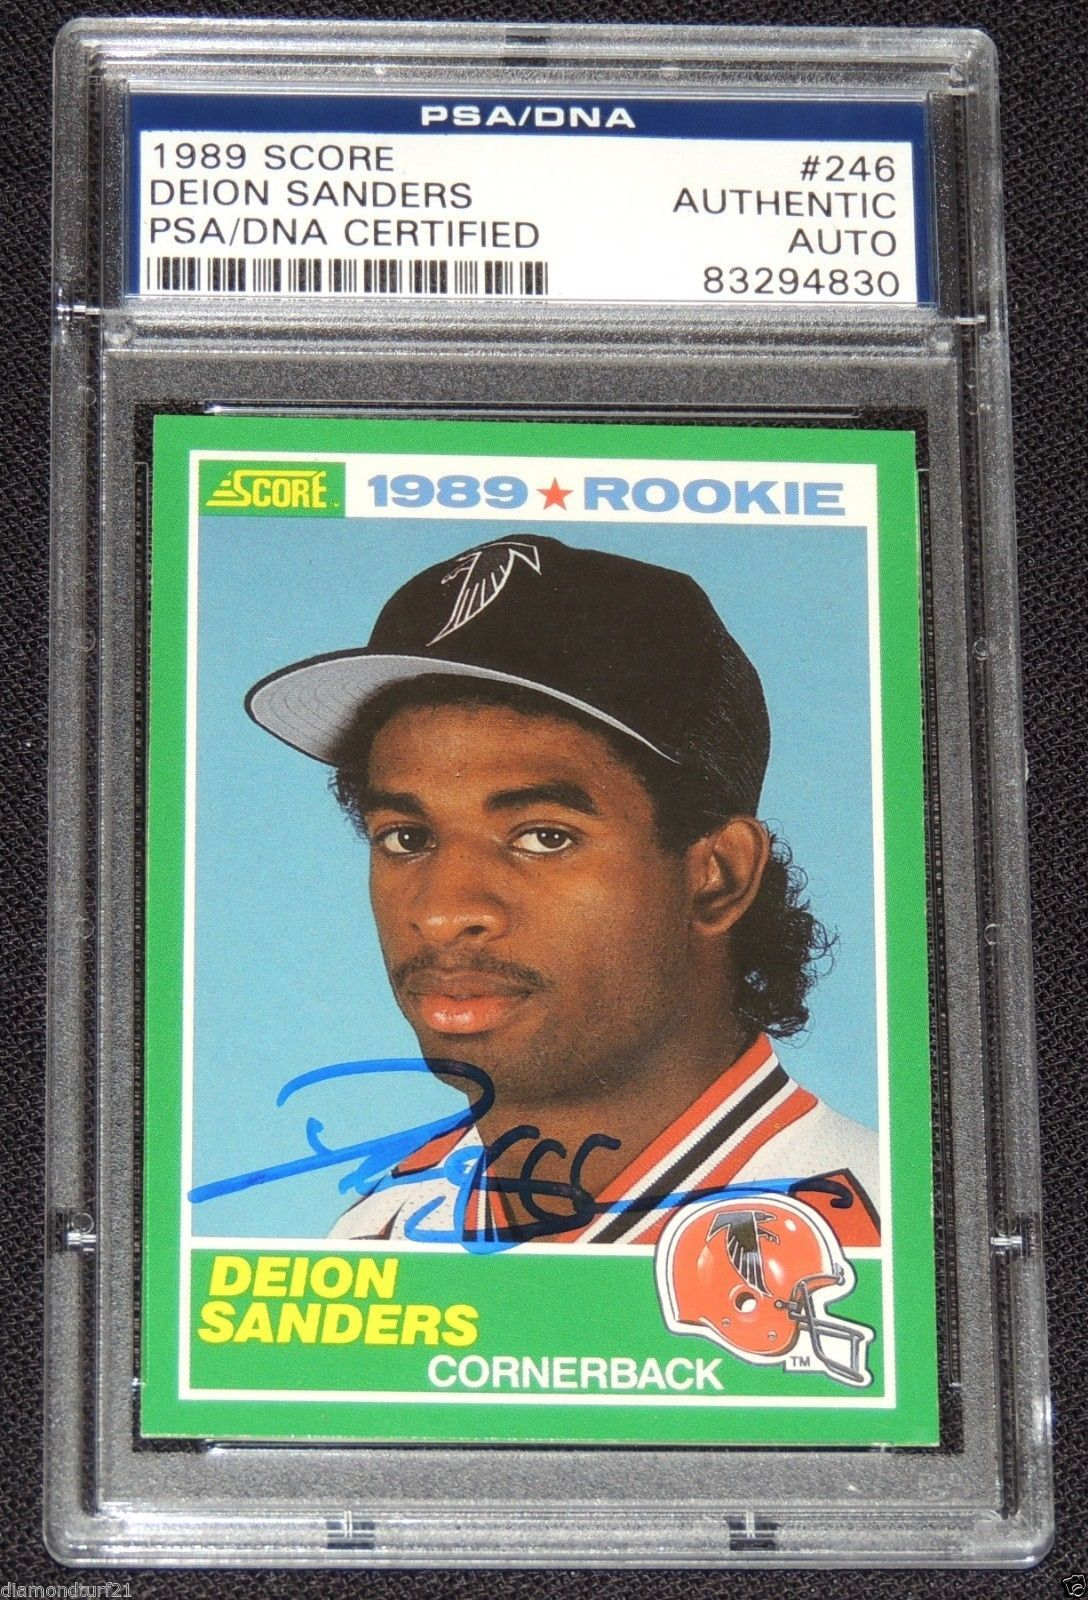 1989 Score Psa Dna Deion Sanders Auto Rookie Falcons 49ers Cowboys Ravens 4830 Atlanta Falcons Signs Football Trading Cards Atlanta Falcons